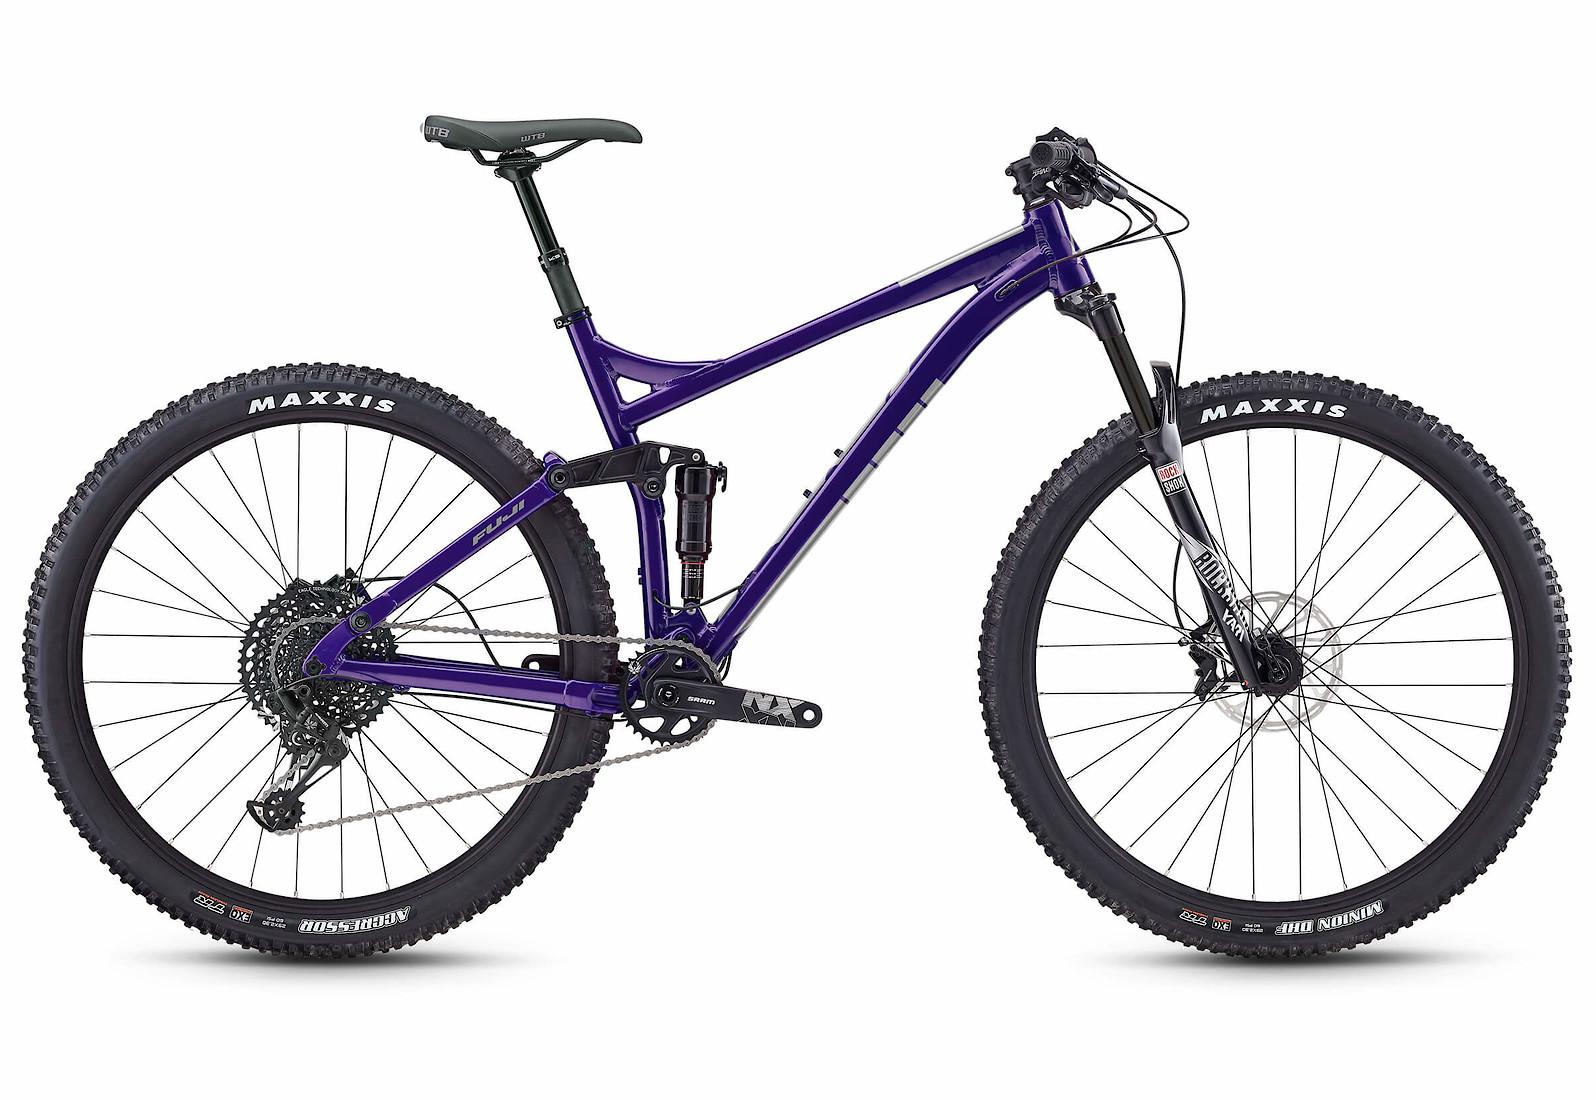 2019 Fuji Outland LT 29 11 Purple